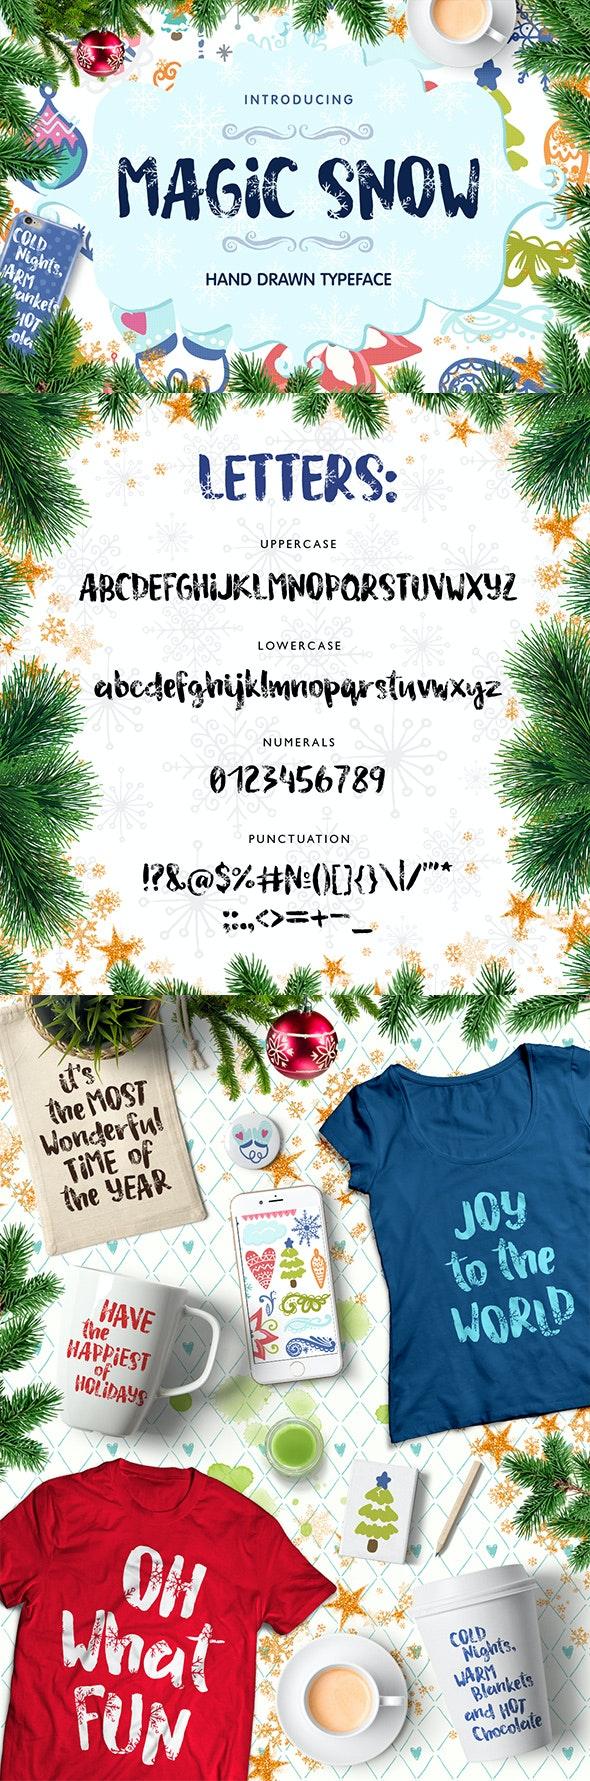 Magic Snow - Christmas Typefase - Handwriting Fonts